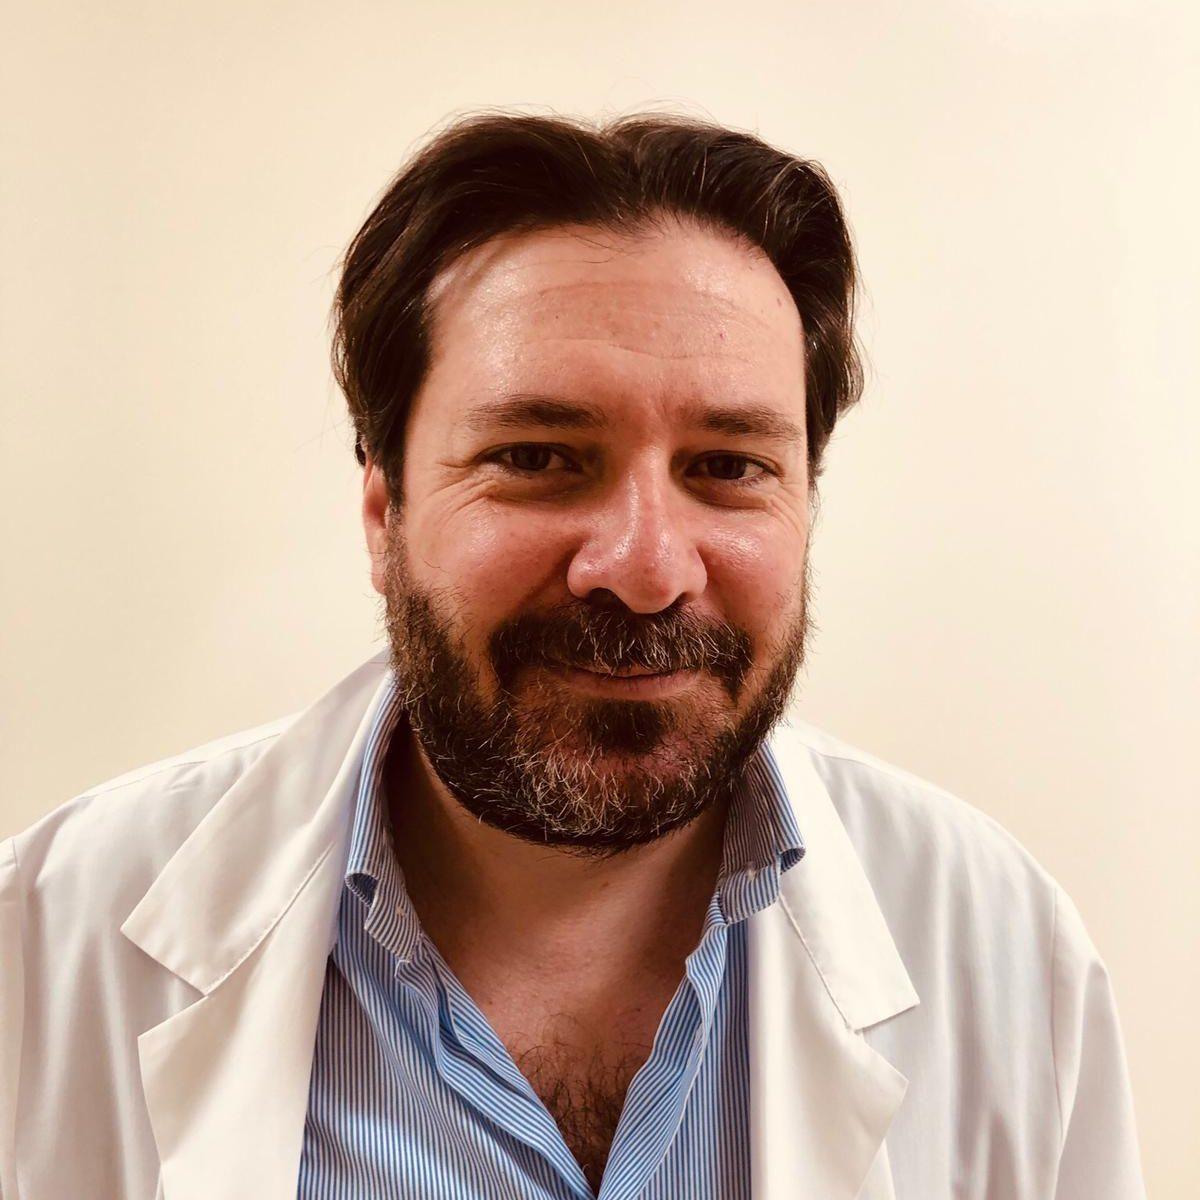 Paolo Ingargiola